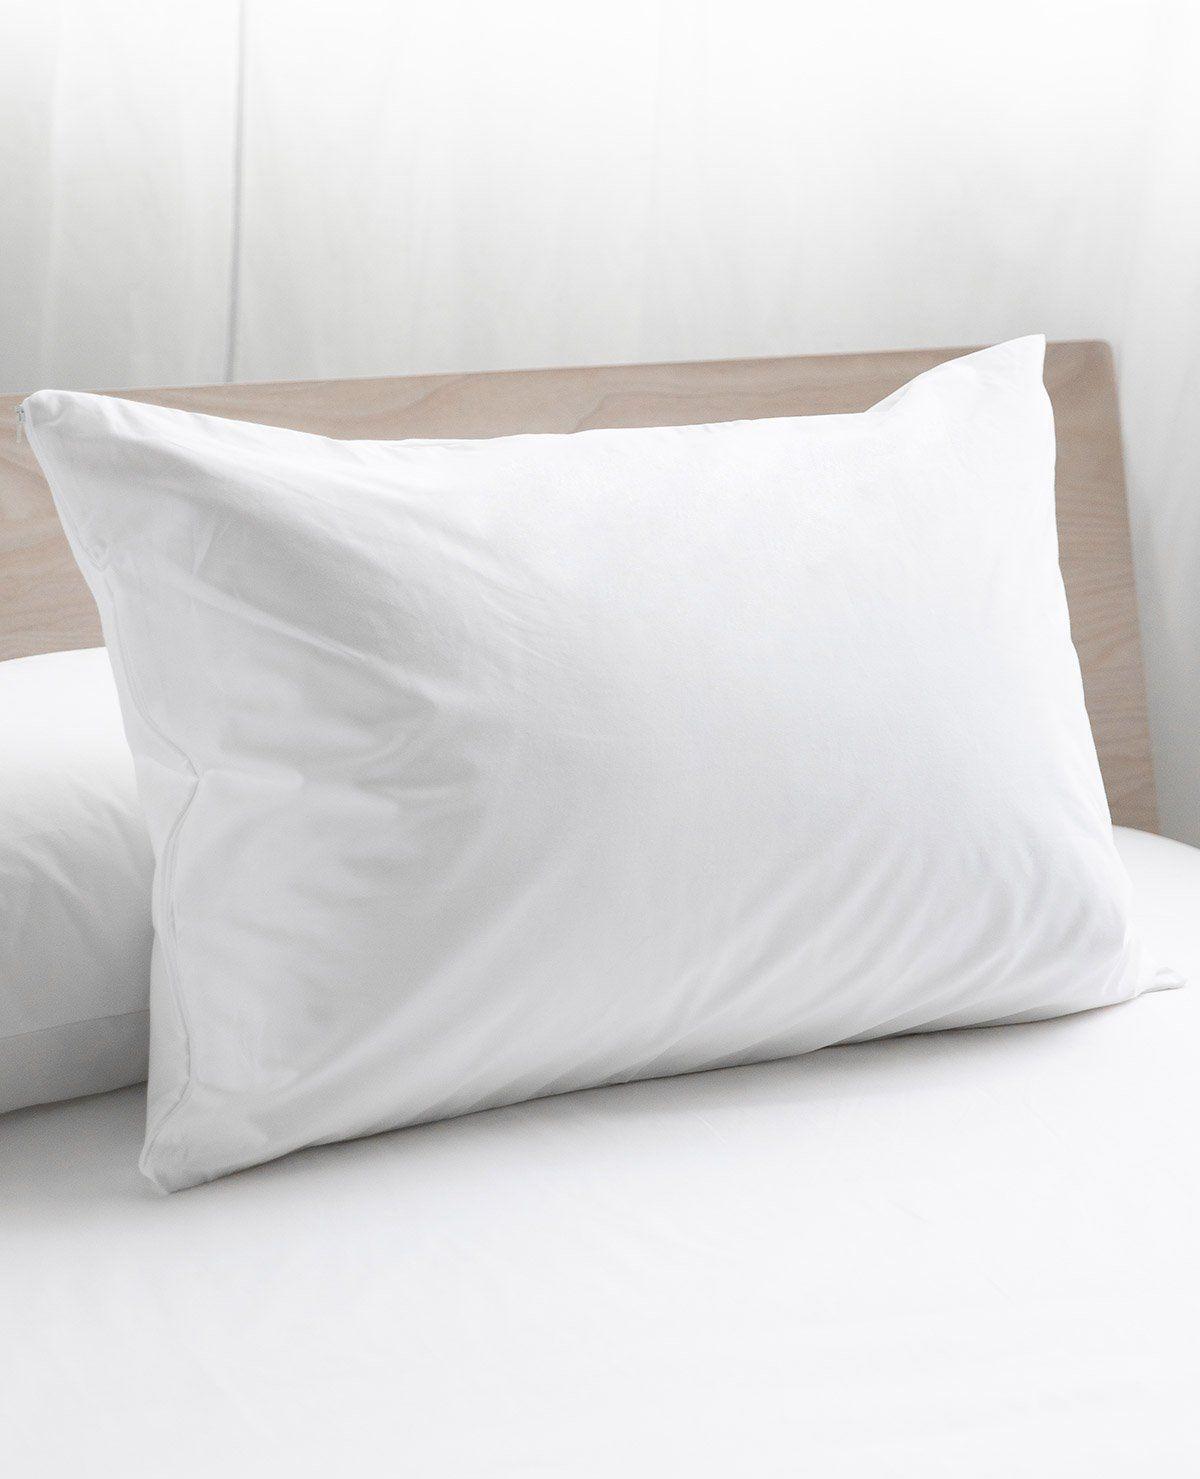 100 Goose Down Pillow Medium Support Goose Down Pillows Pillows Down Pillows